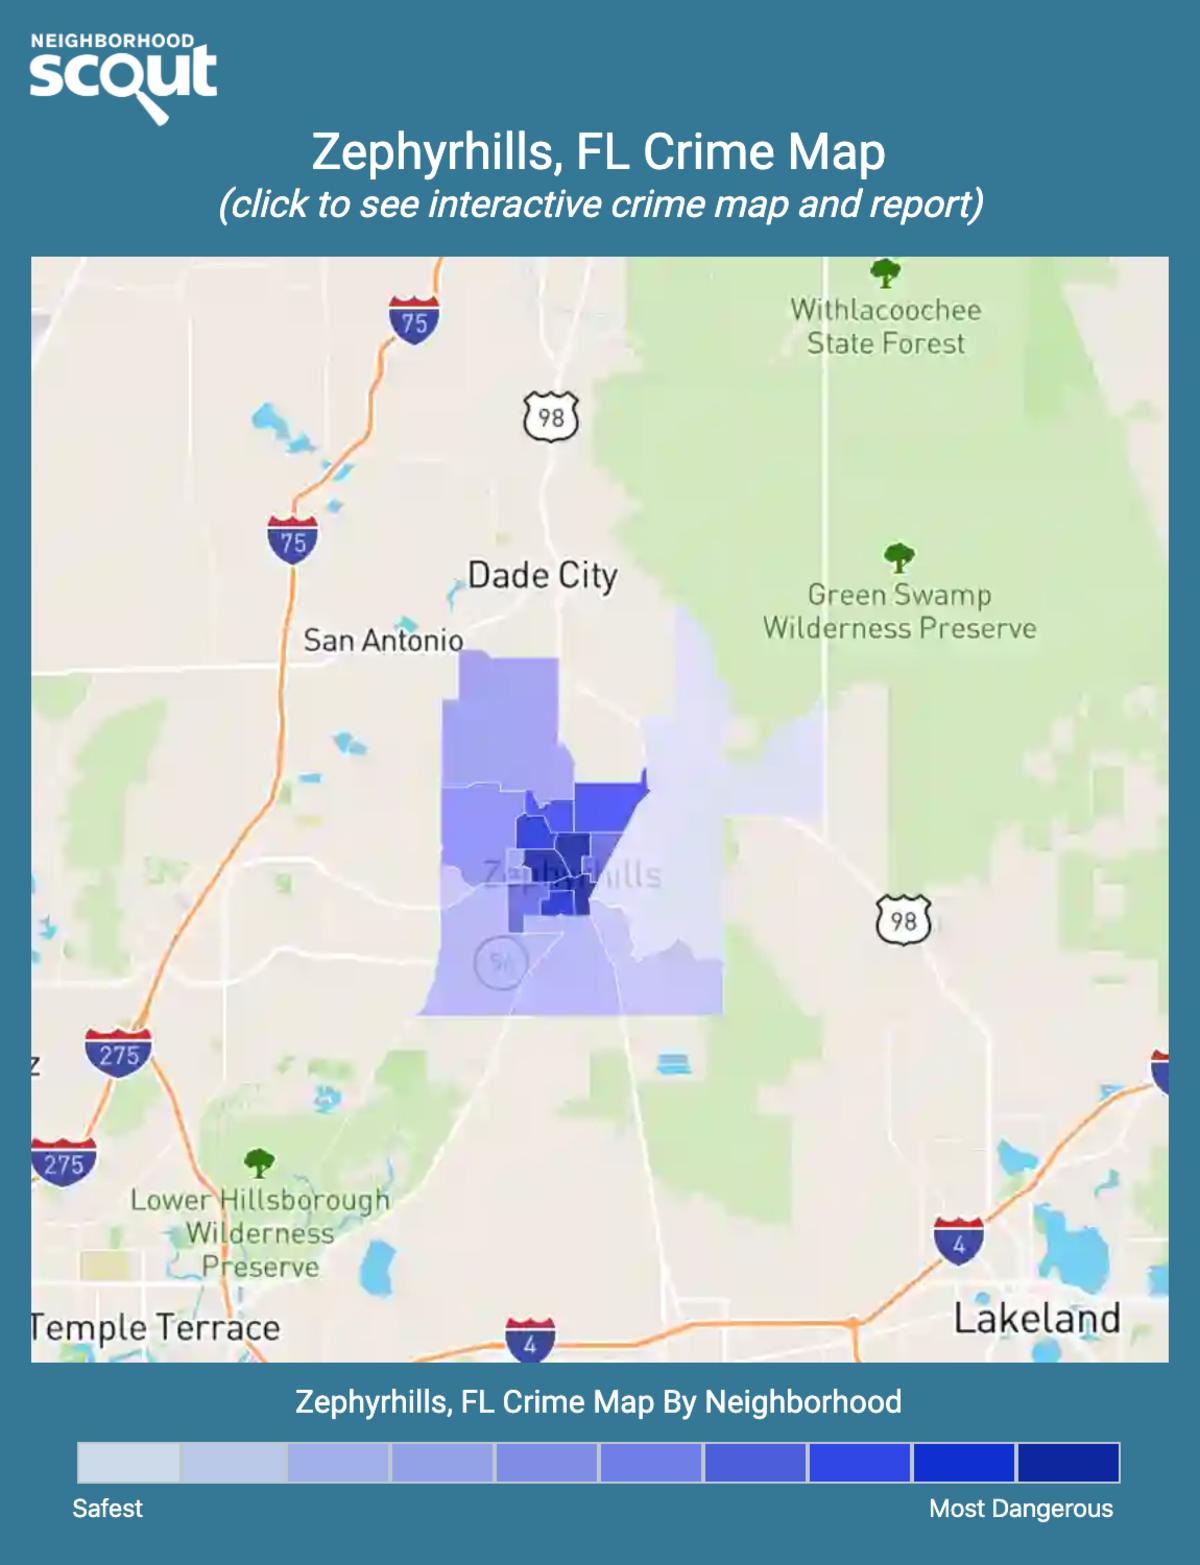 Zephyrhills, Florida crime map